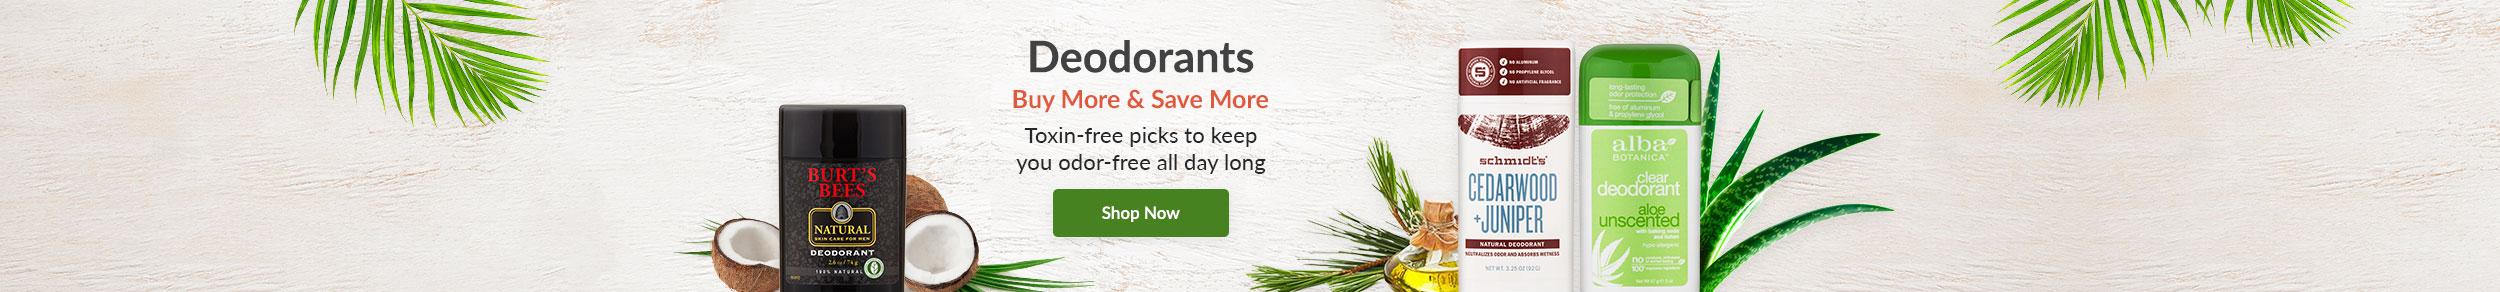 https://i3.pureformulas.net/images/static/Deodorant-Essentials_Beauty-1_092118.jpg